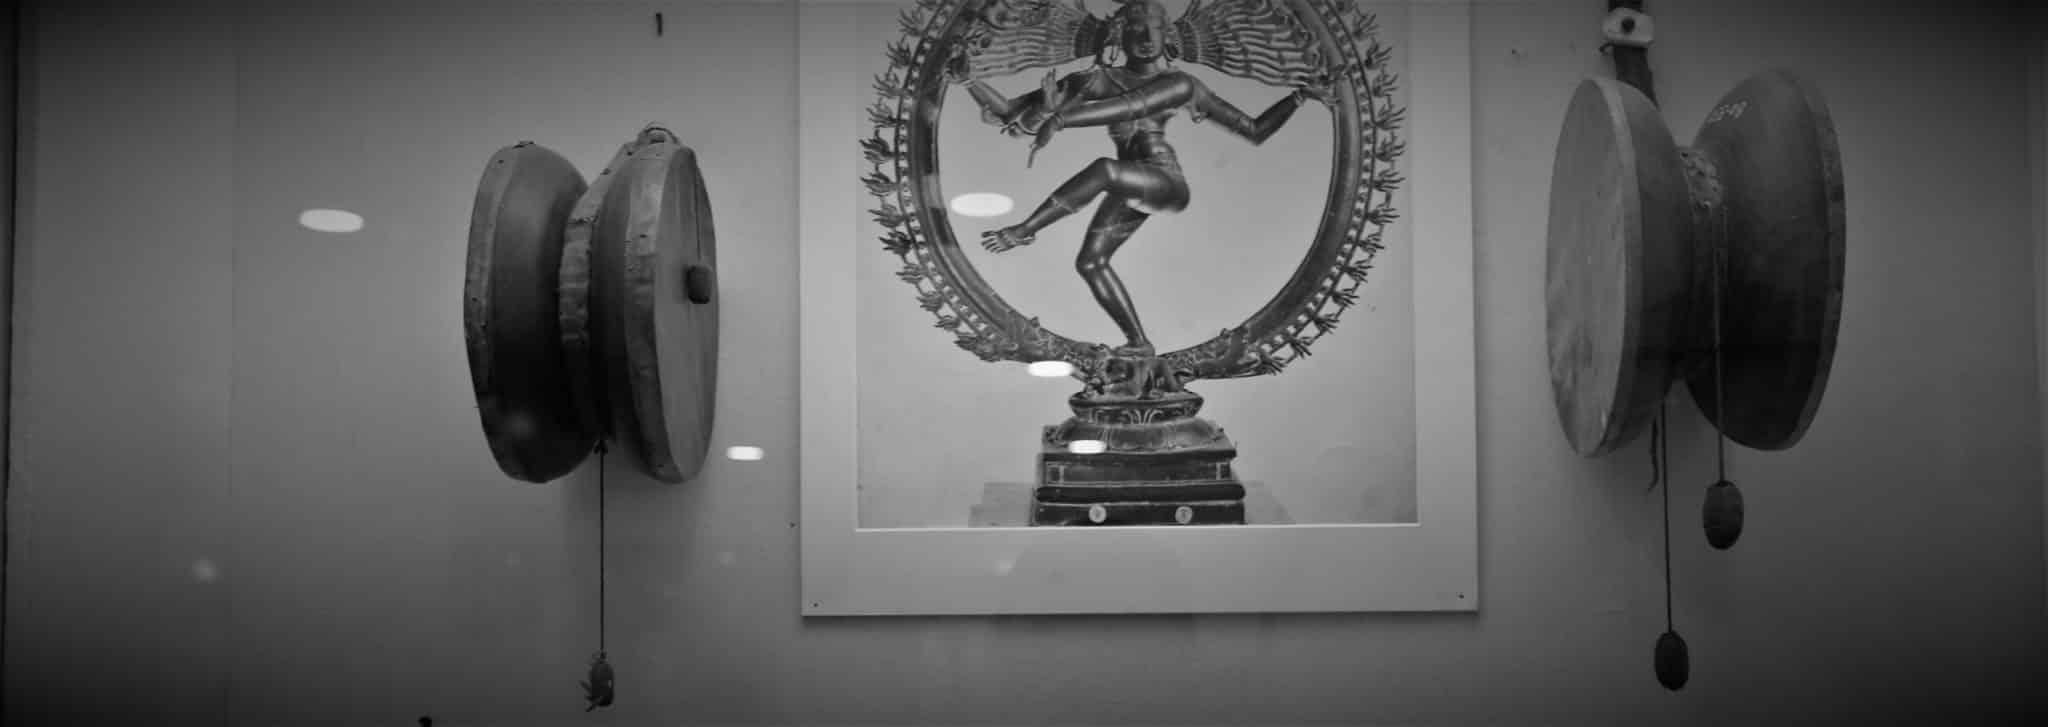 Damaru Tambour Shiva Musée Delhi